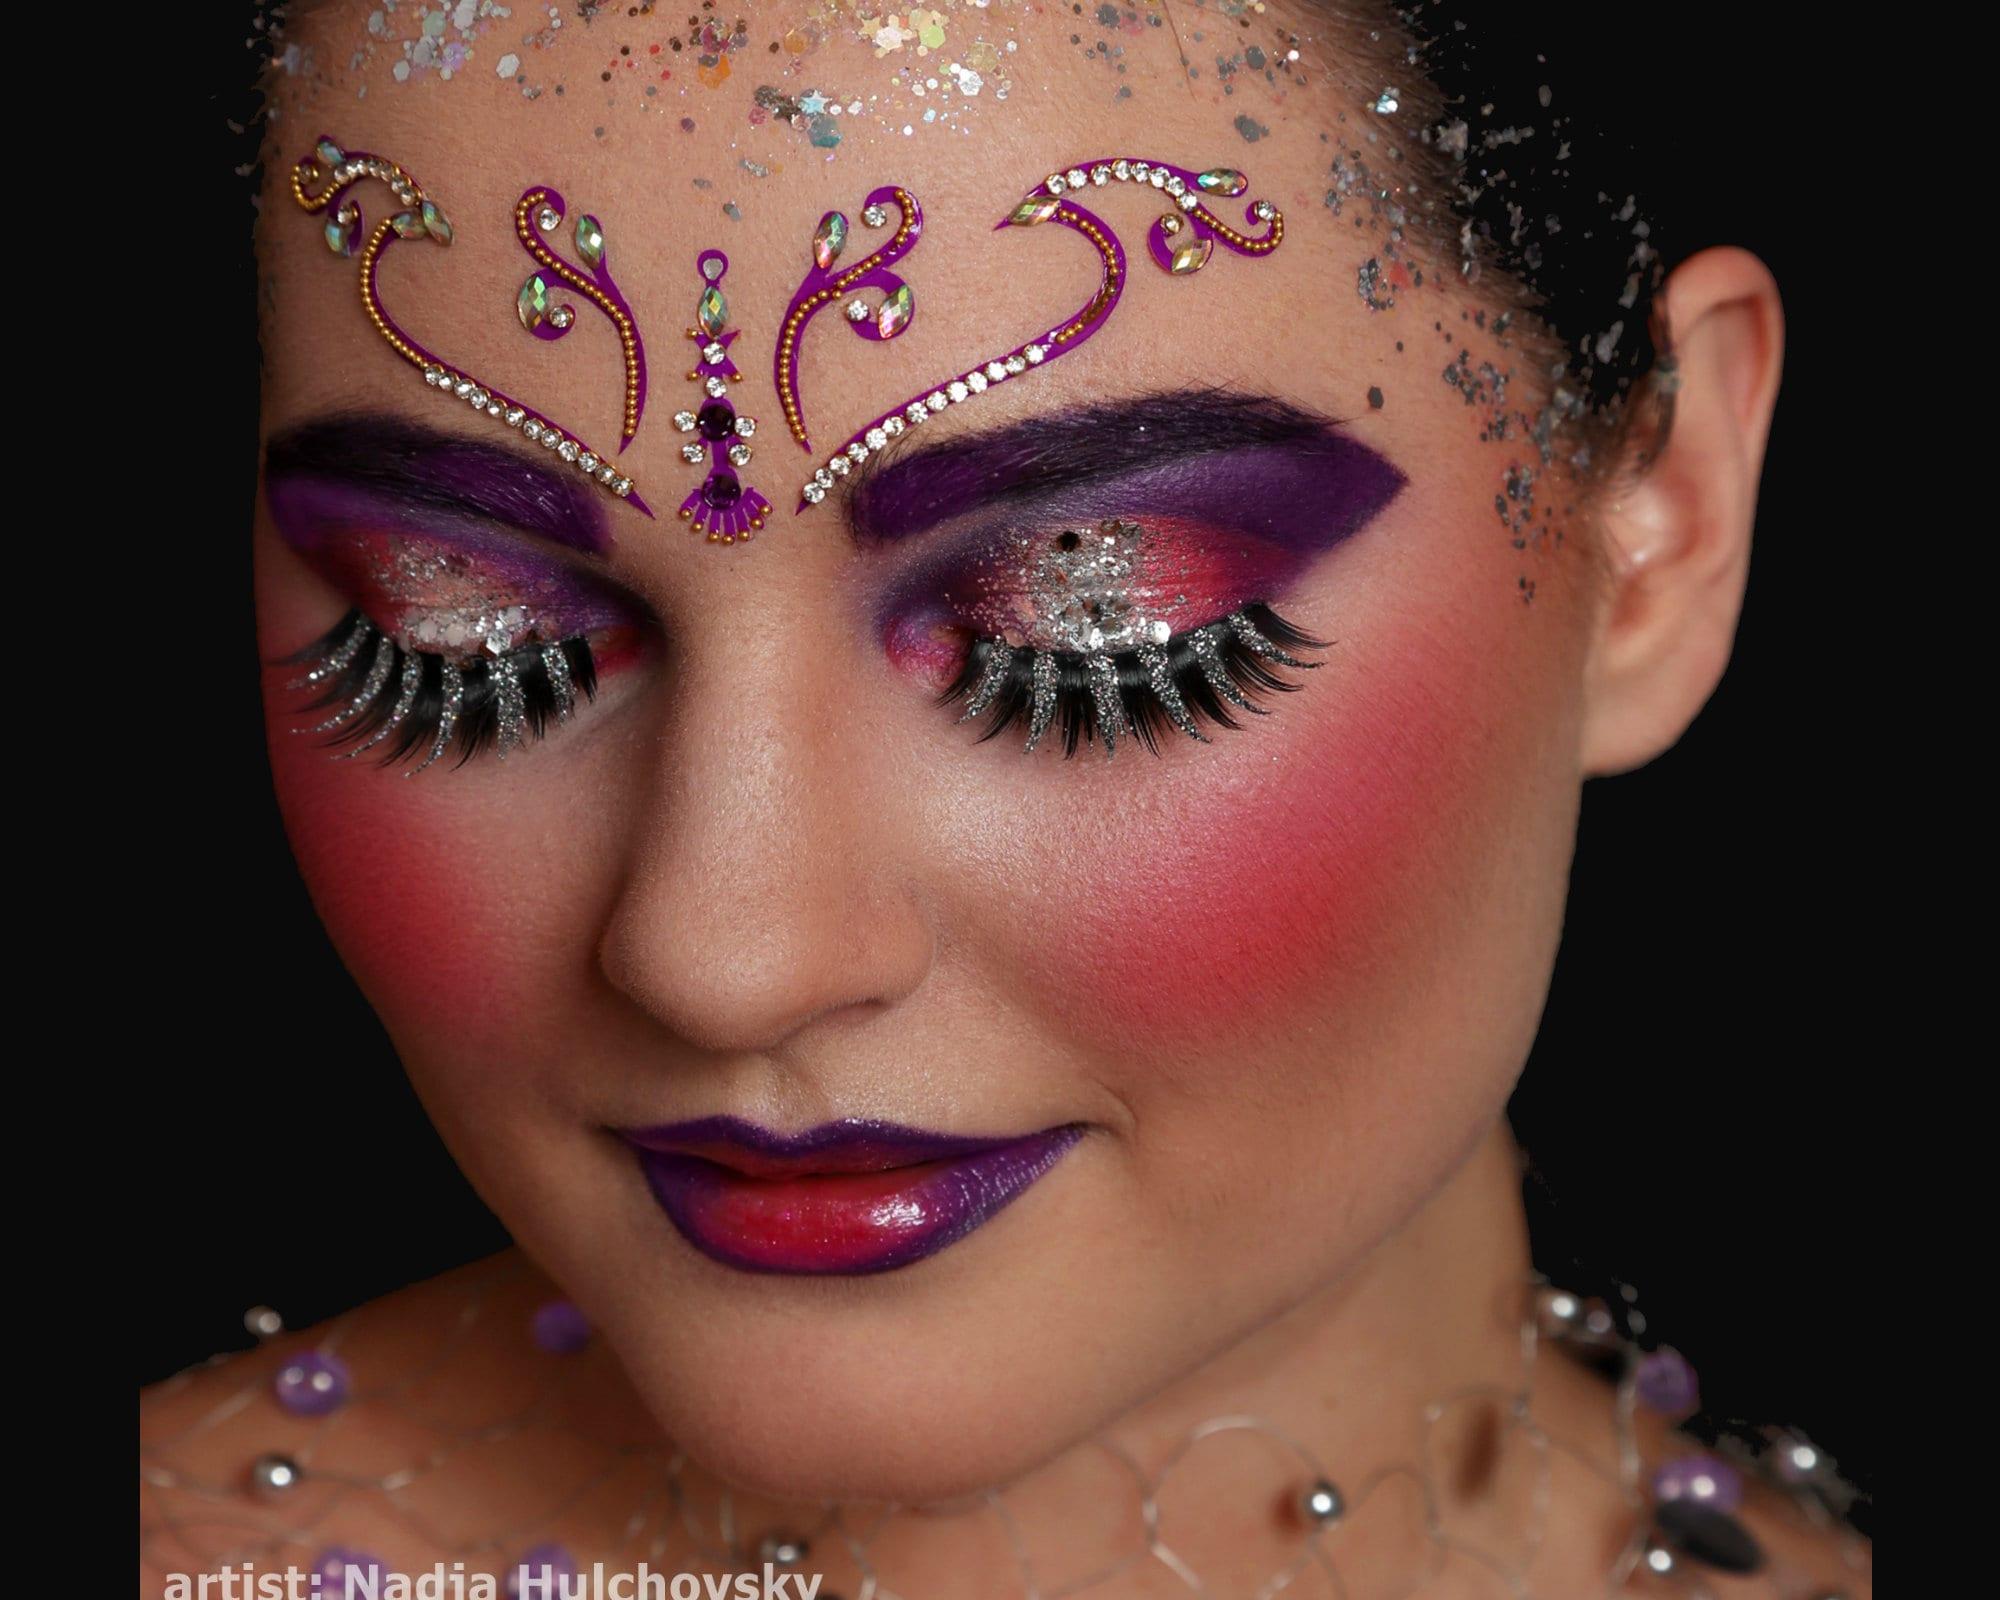 Fluorescent Face JEWEL Stick on Body Art UV BINDI Pack-Rave FESTIVAL FACE GEMS